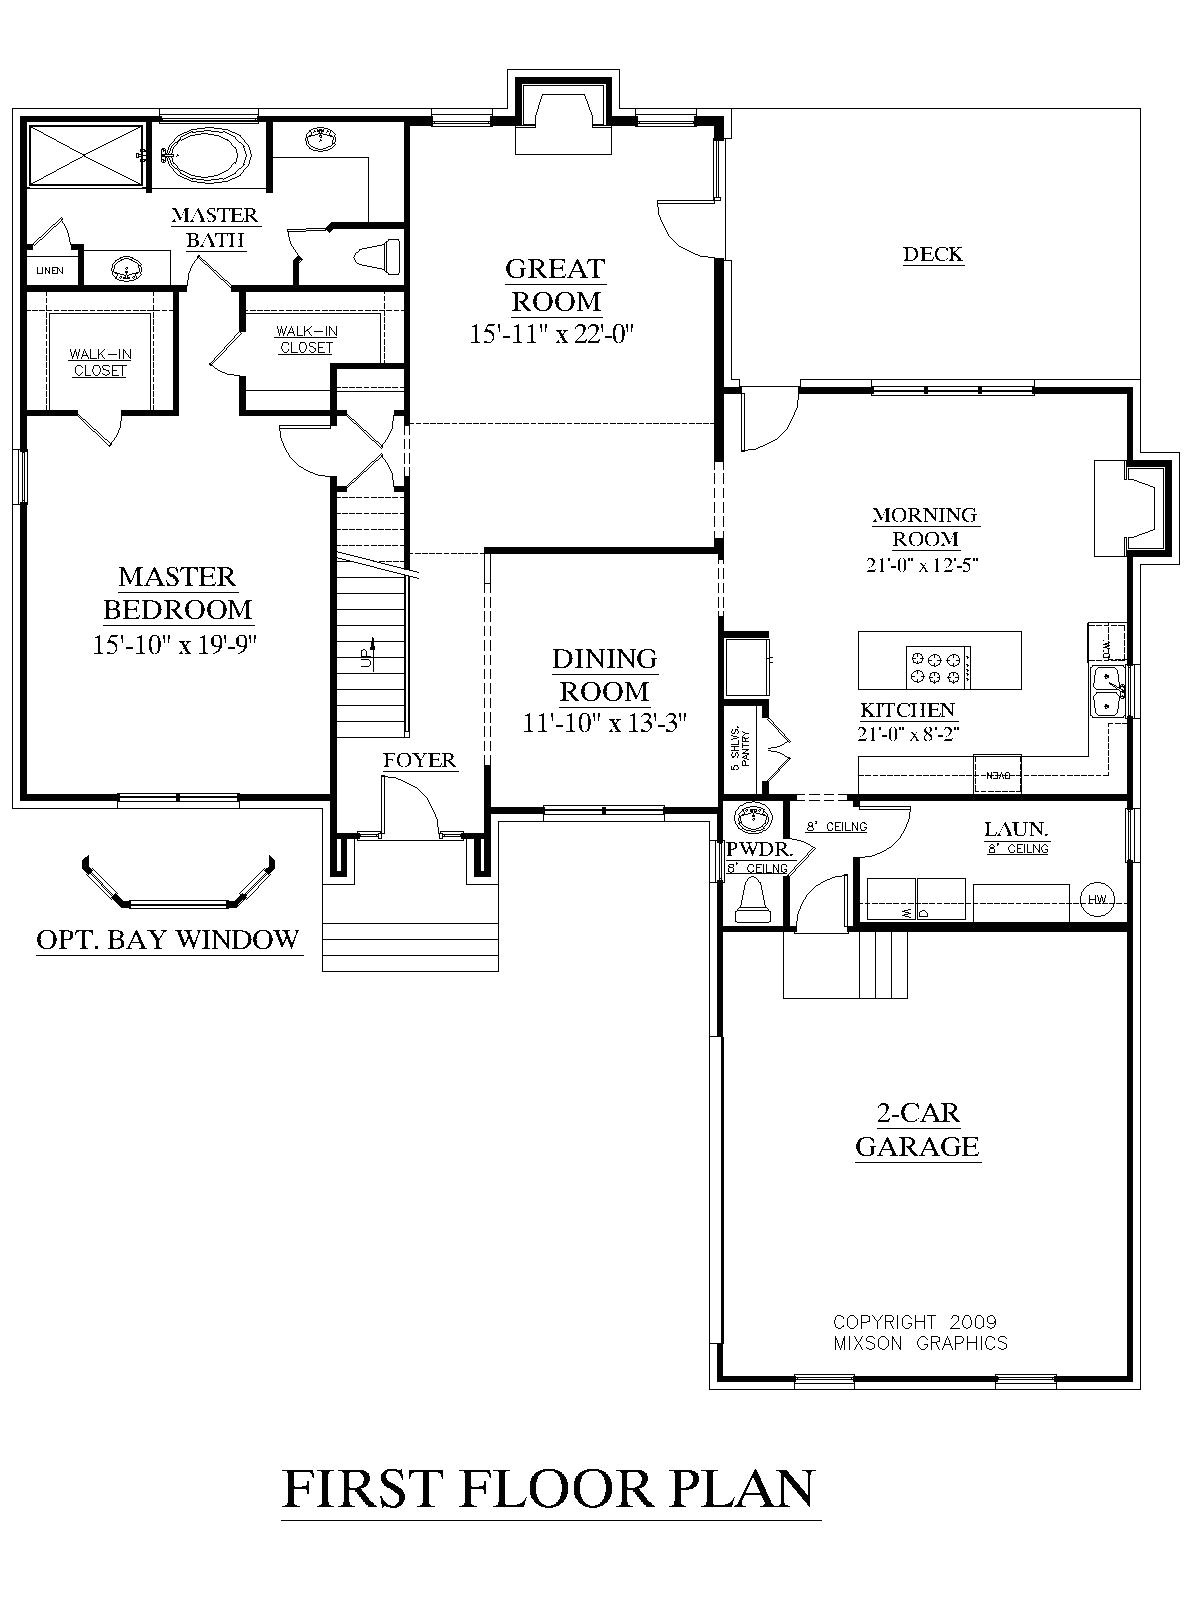 house plans 1st floor master bedroom